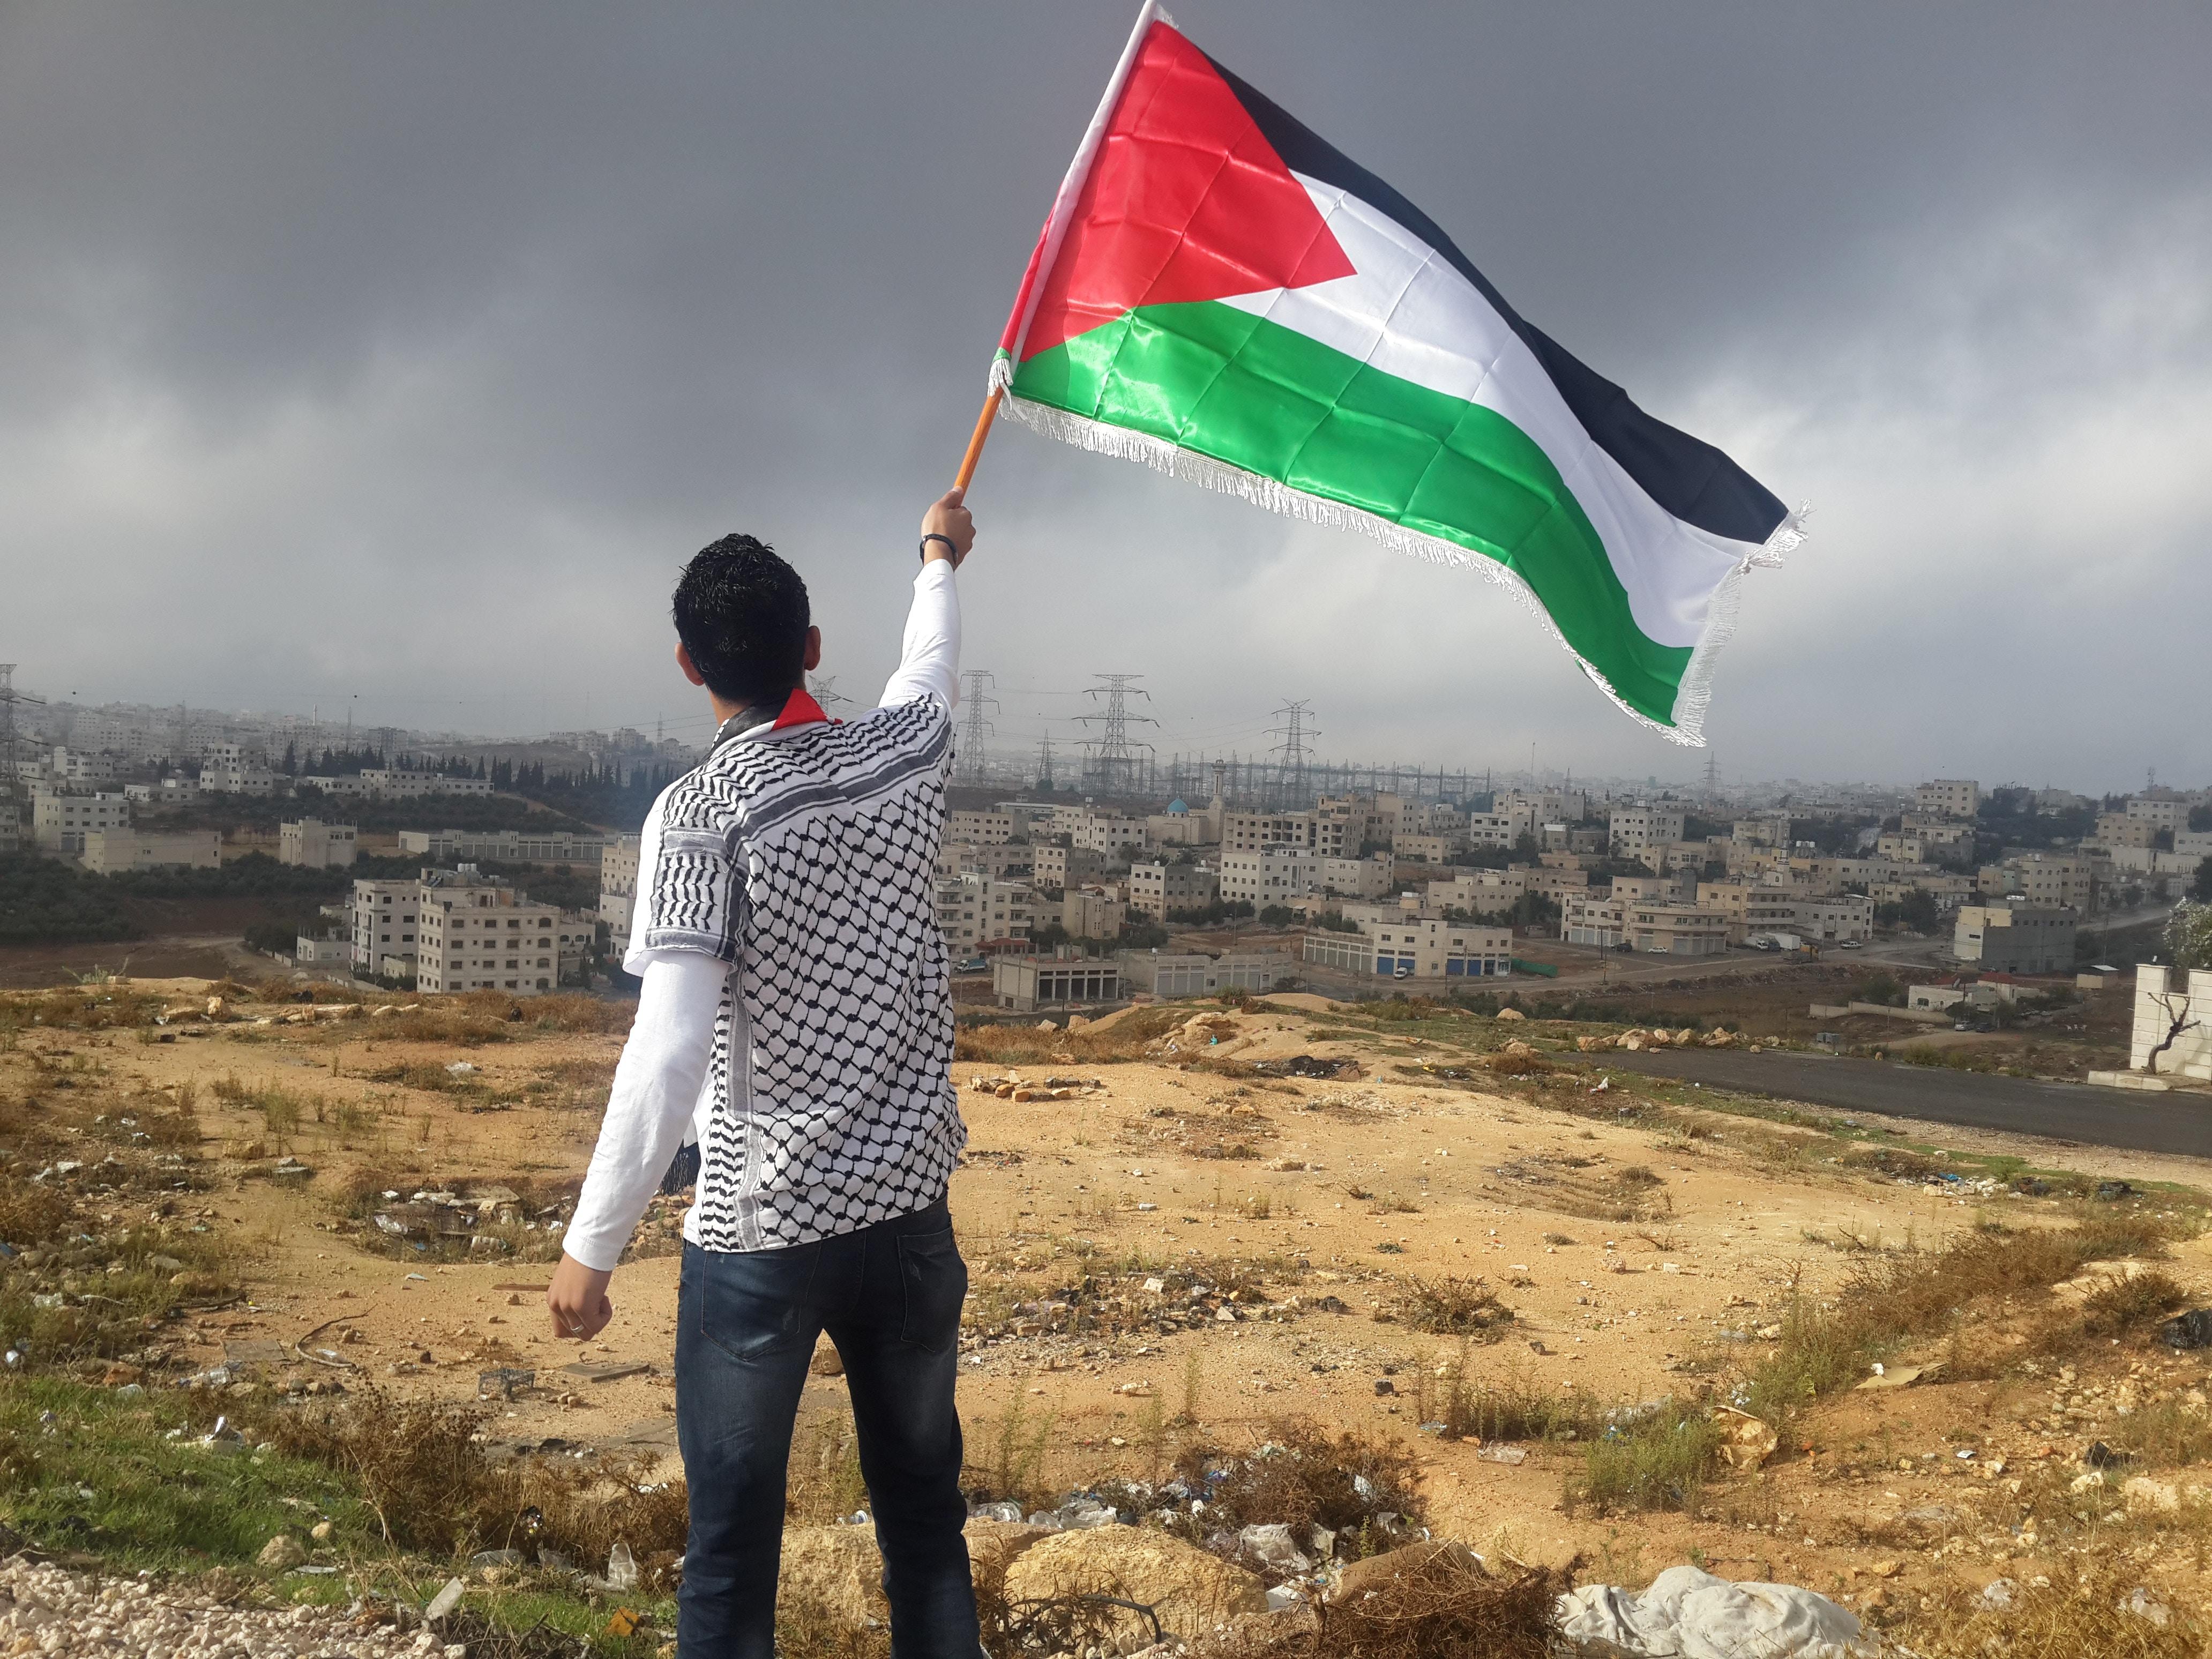 The First Intifada: Anti-Israel Lies & Intra-Palestinian Violence